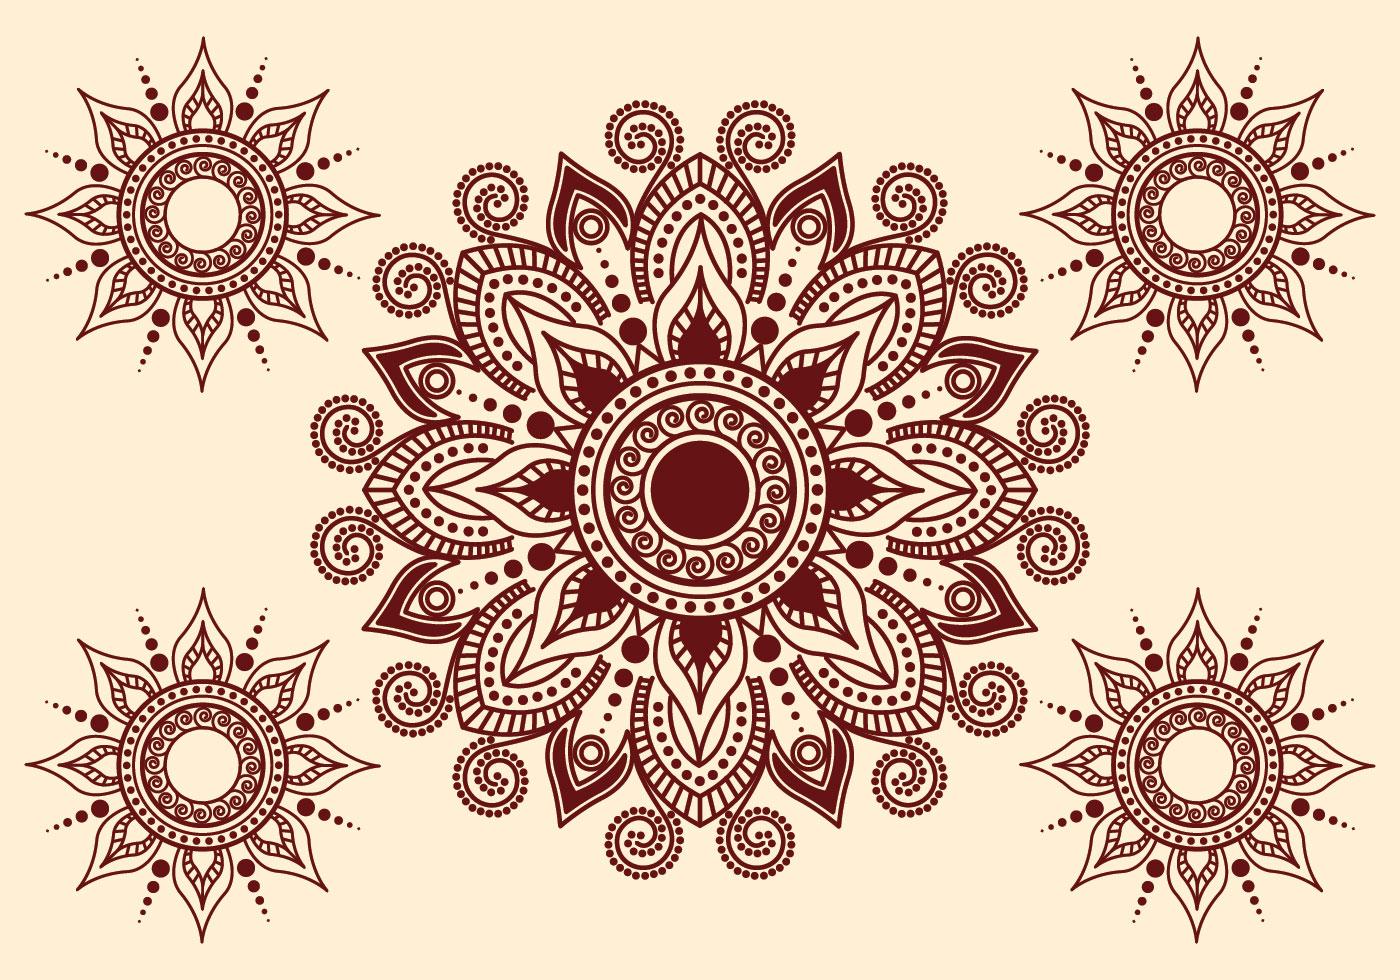 Henna Tattoo Free Vector Art 4045 Free Downloads